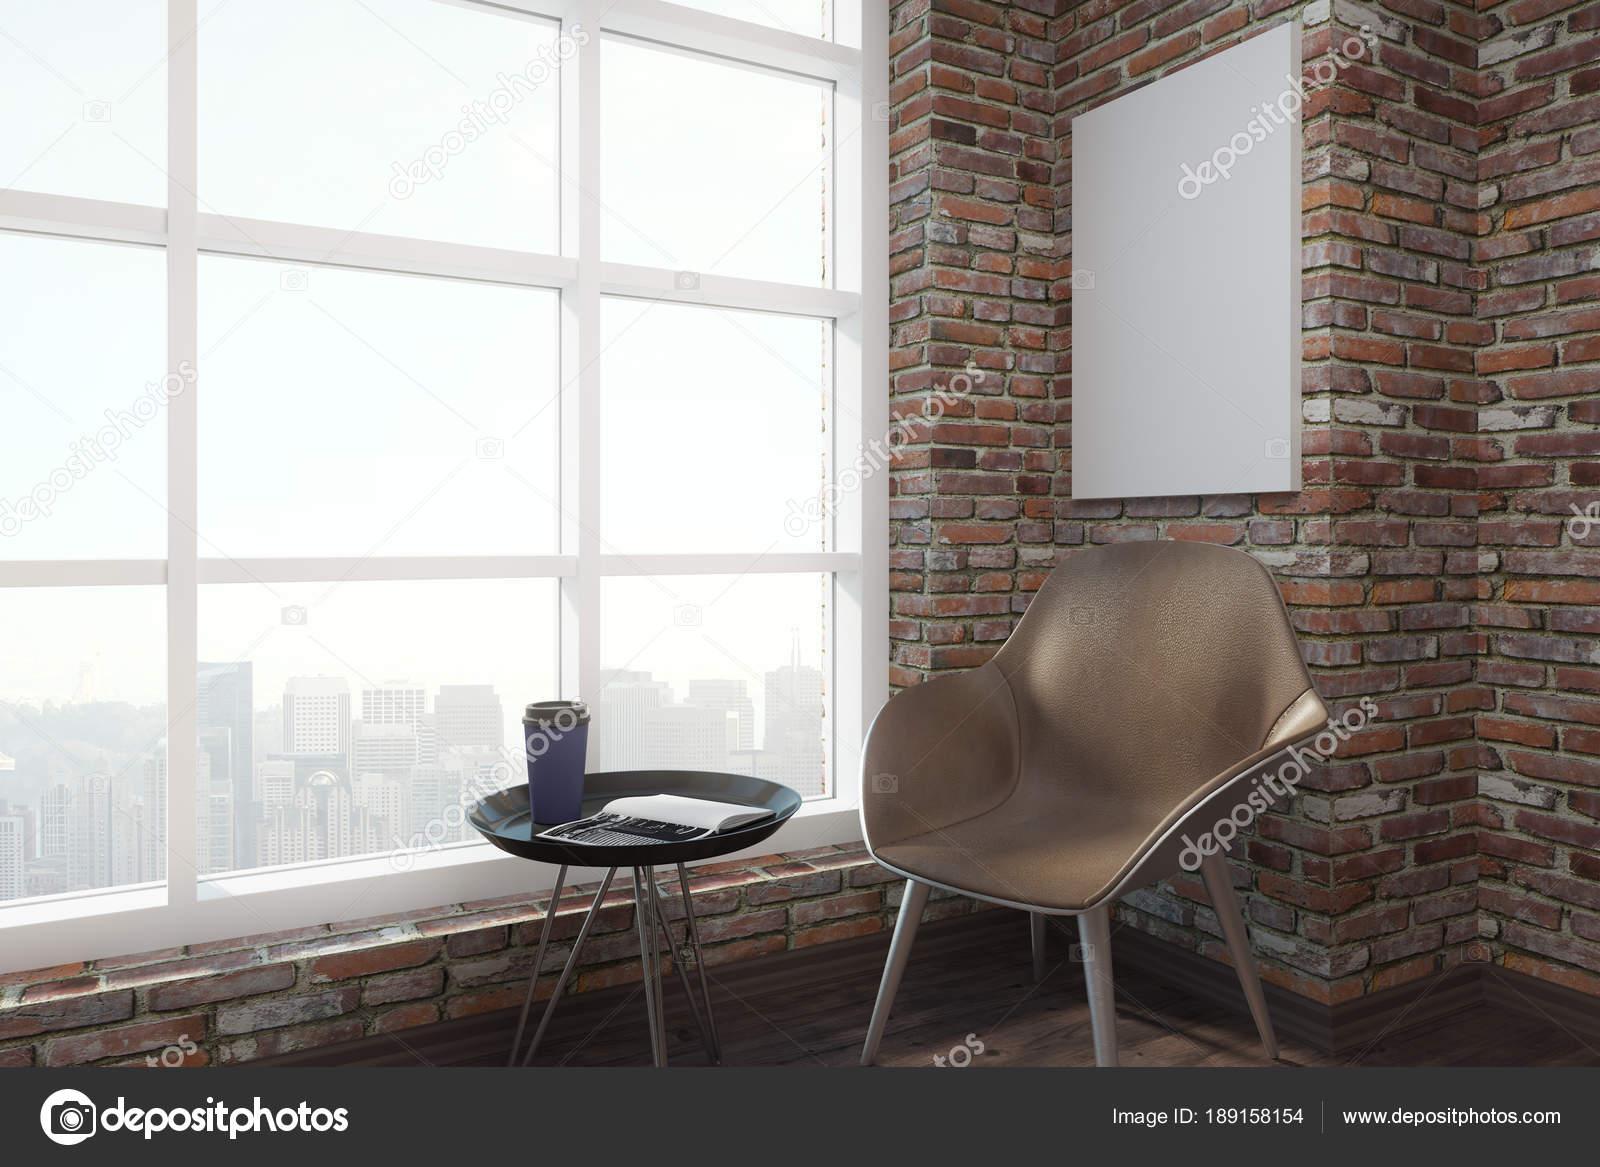 Modernes interieur mit stuhl und poster u stockfoto peshkova